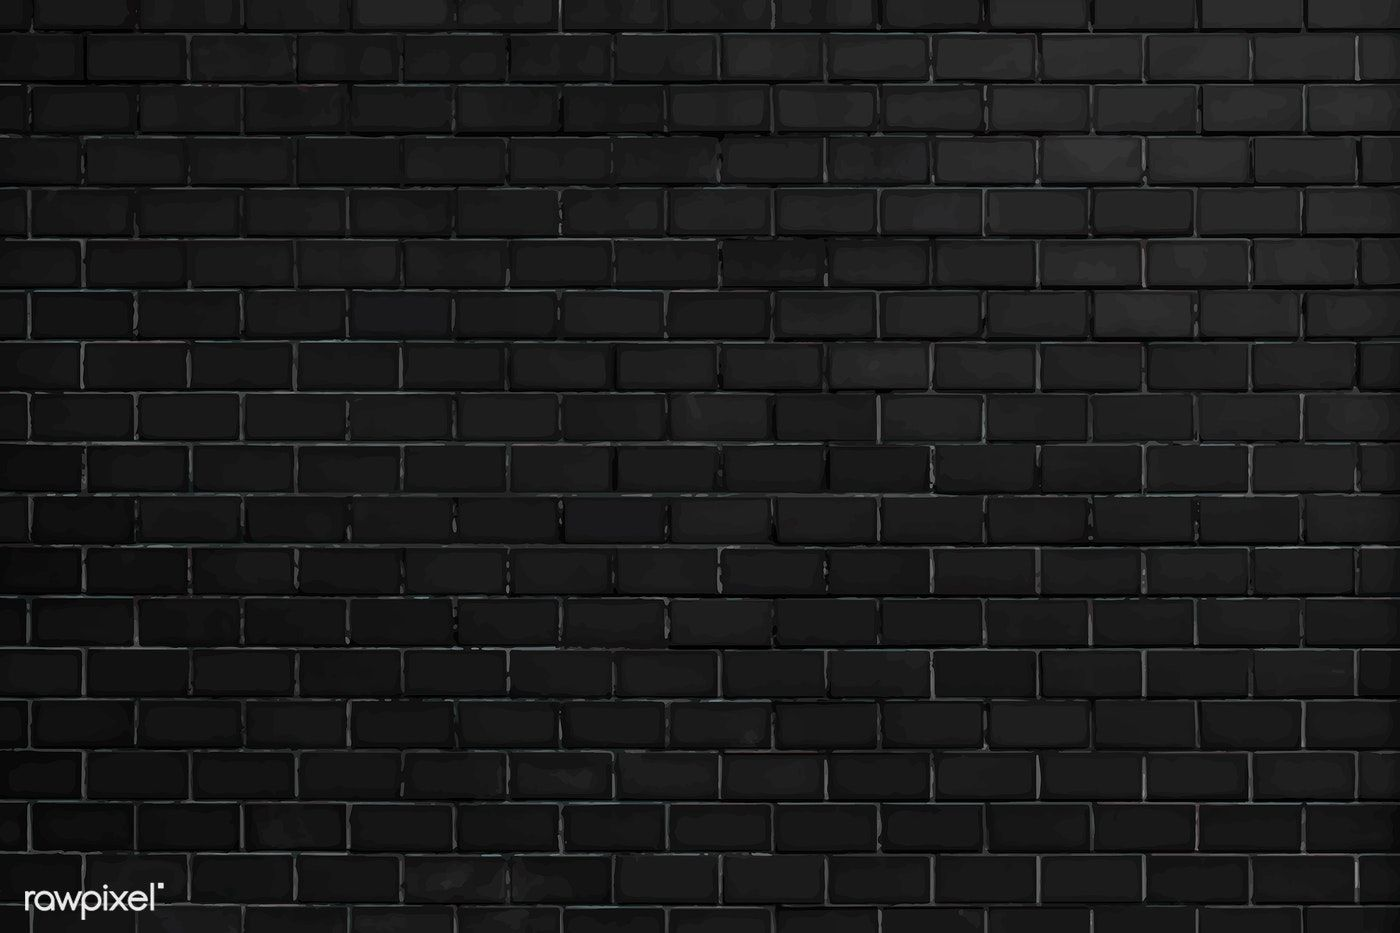 Download Premium Vector Of Black Brick Wall Textured Background 514140 Black Brick Wall Black Brick Textured Background